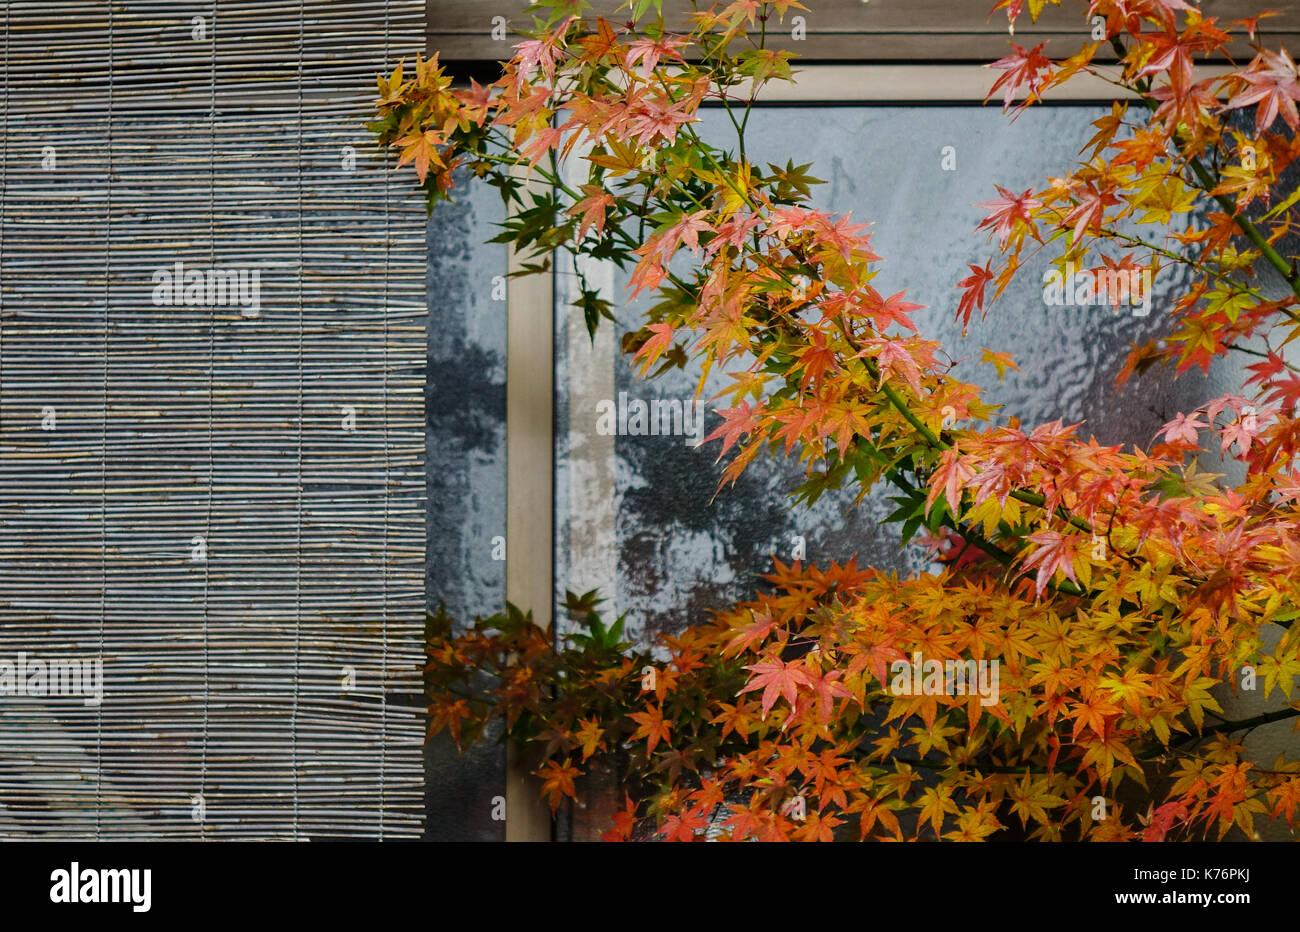 Ahornblatter Mit Bambus Vorhang Fur Traditionelles Haus Dekoration